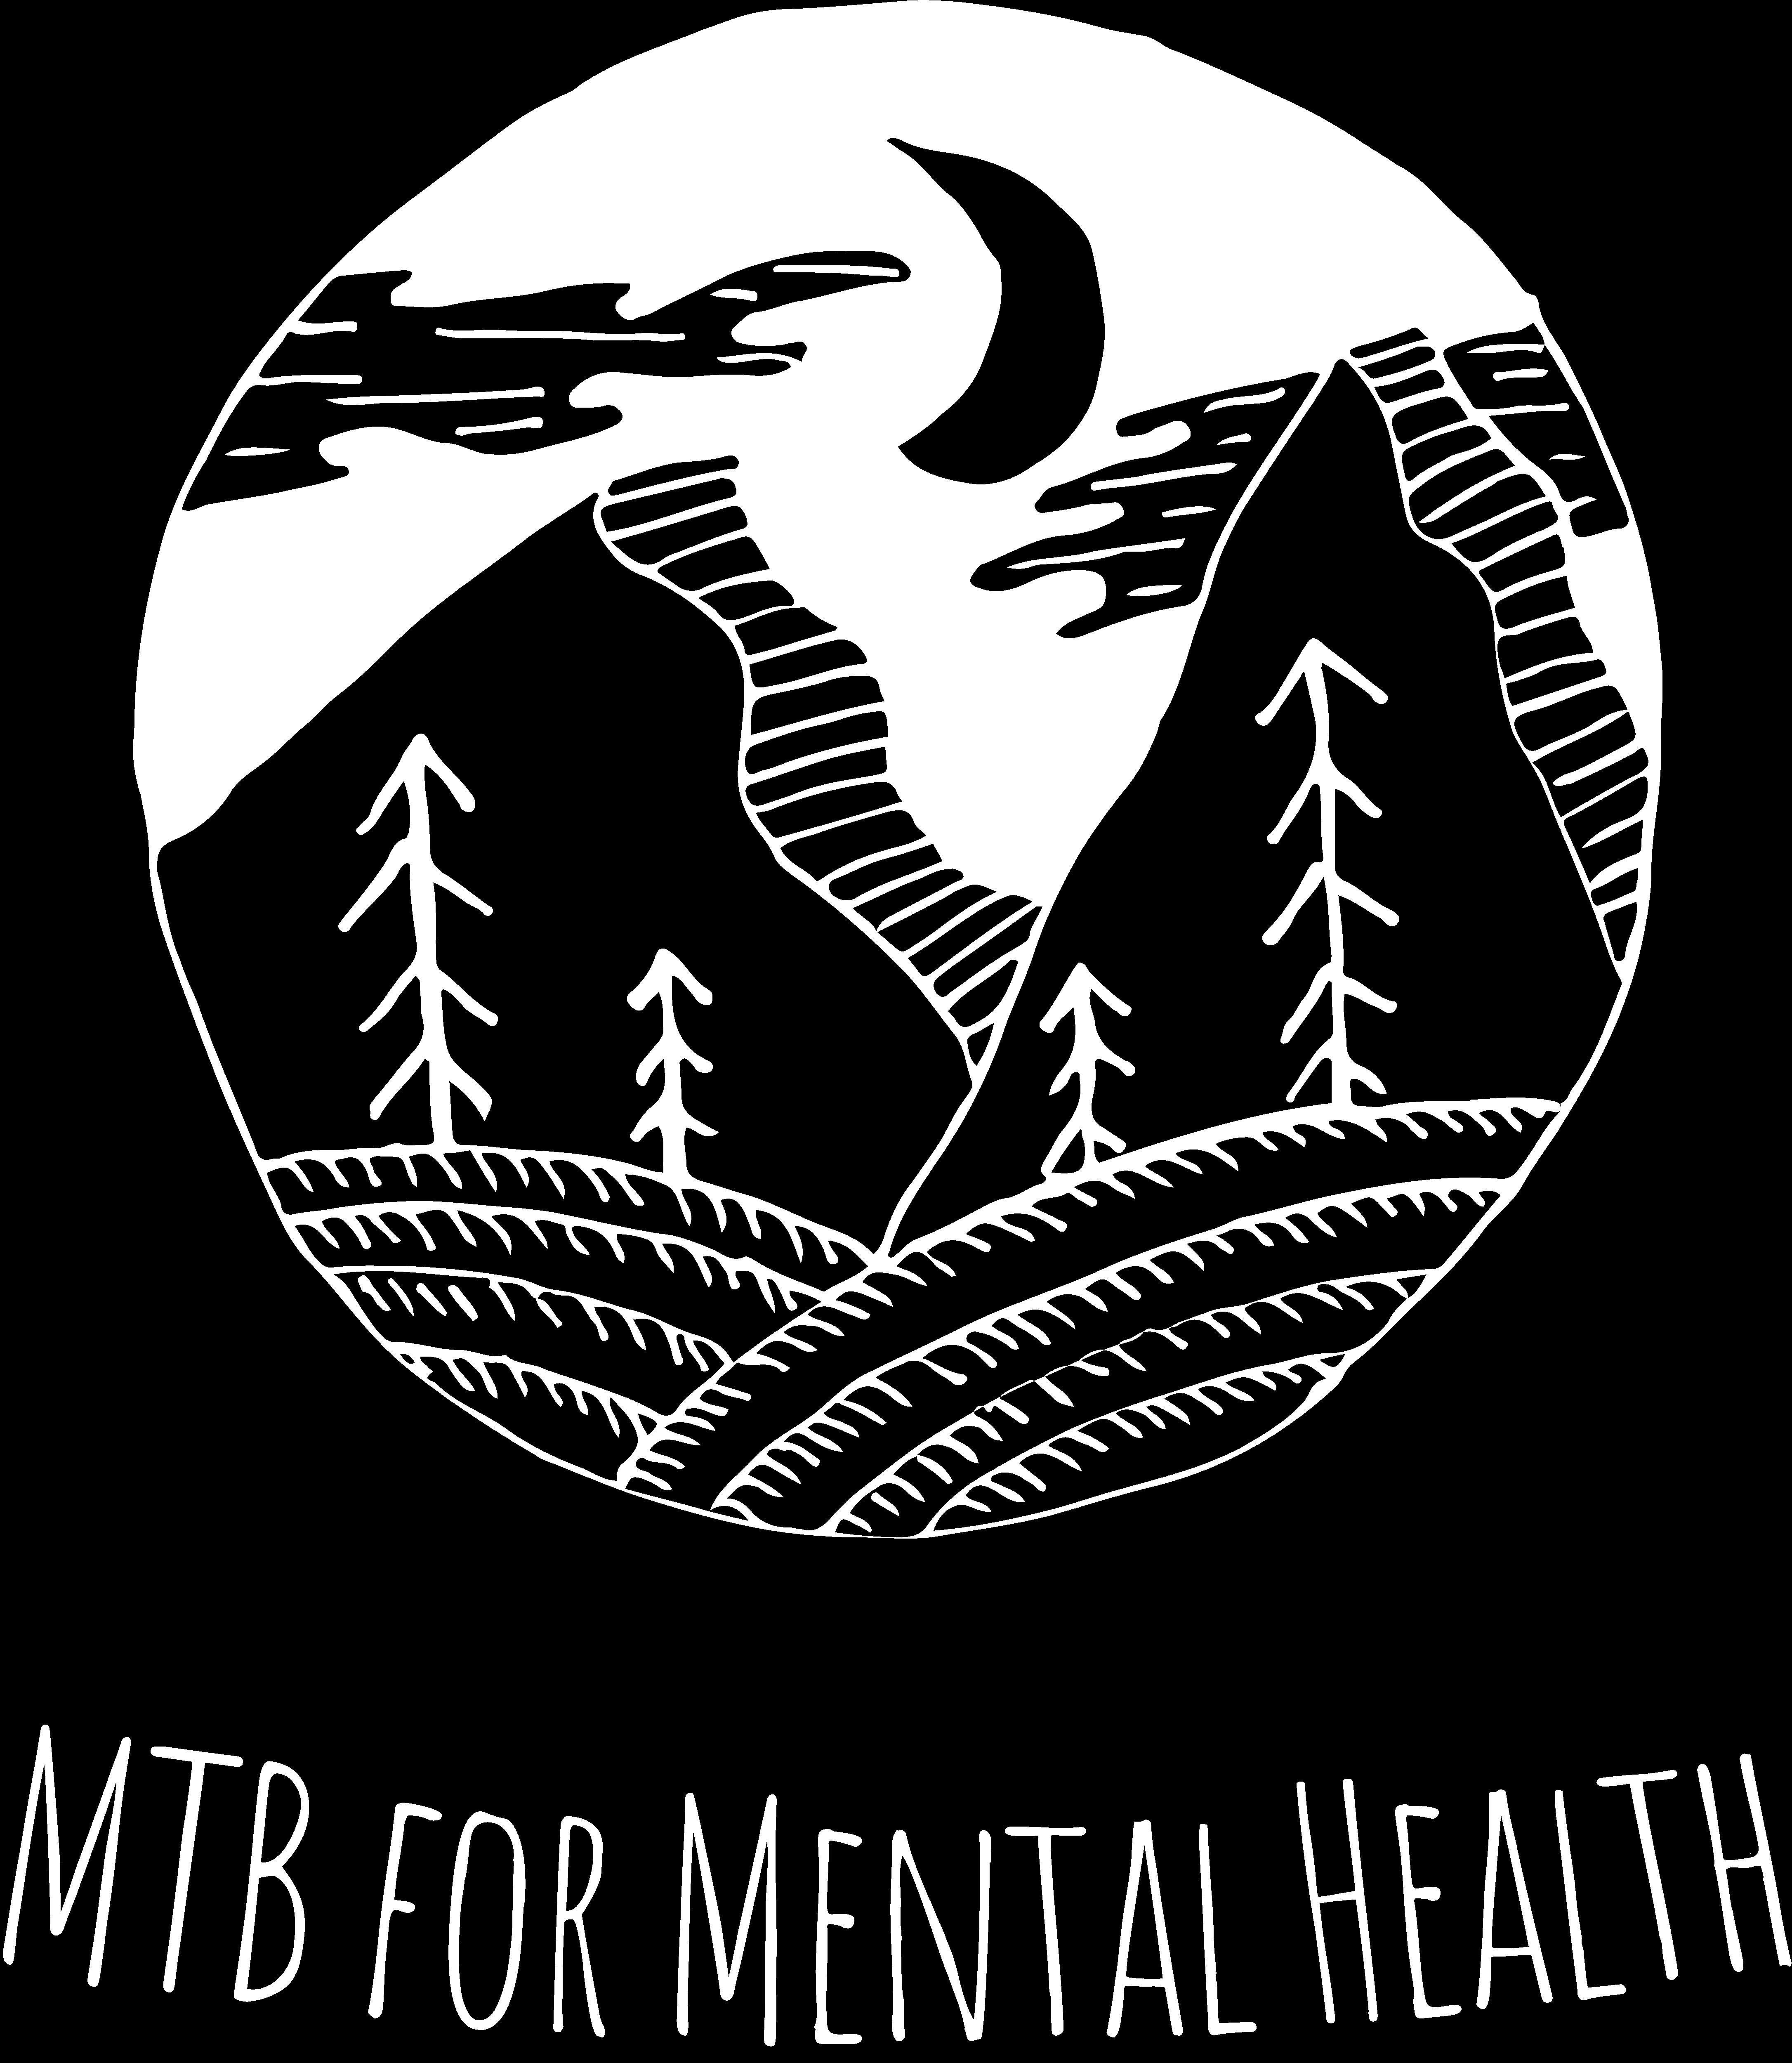 MTB for Mental Health